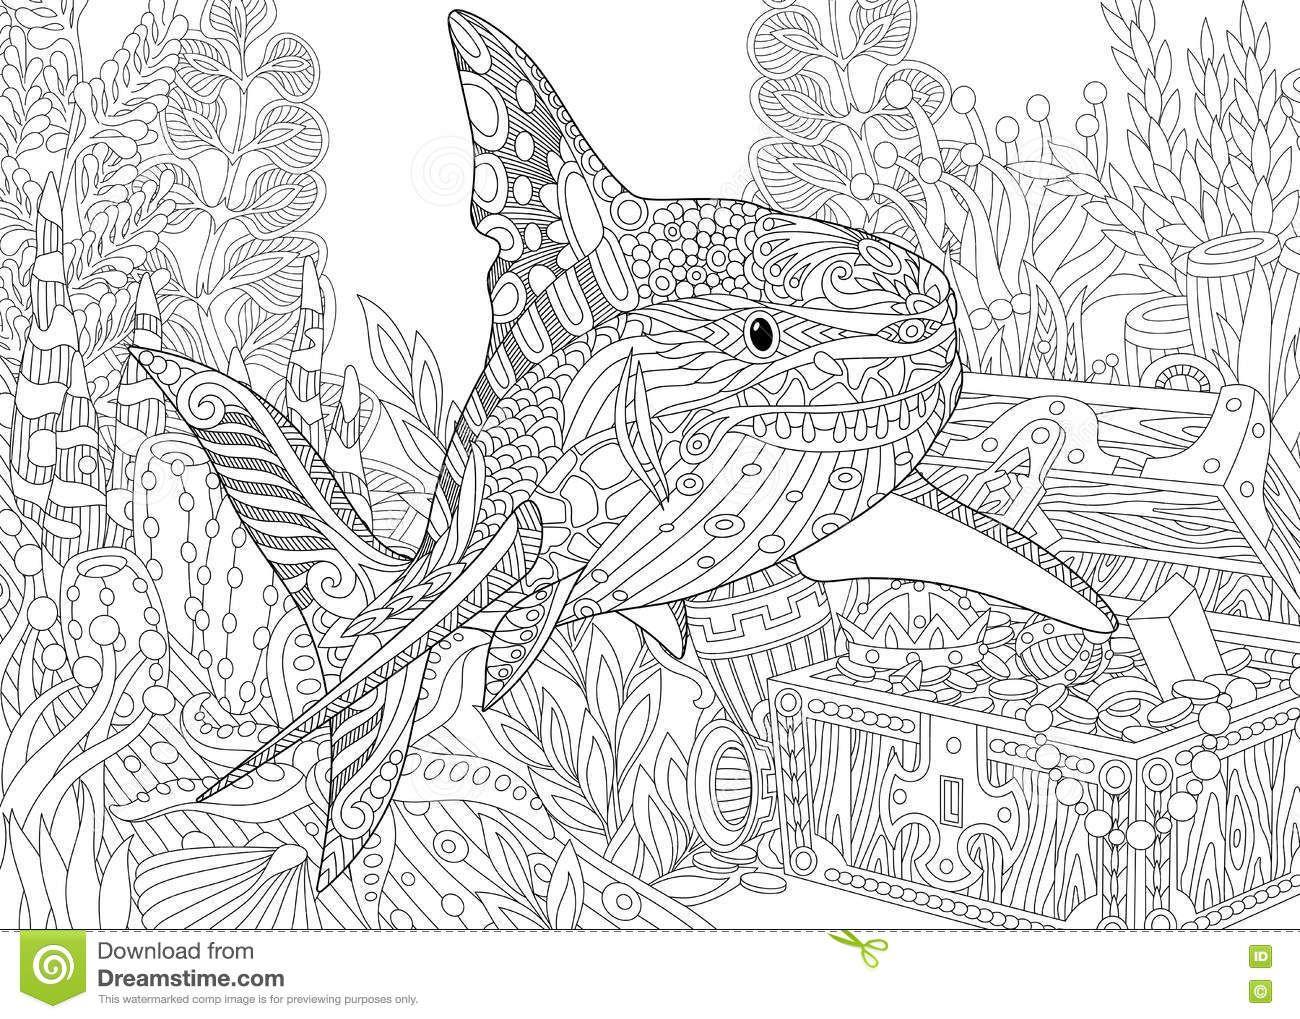 Pin von Barbara auf coloring dolphin, whale, shark | Pinterest